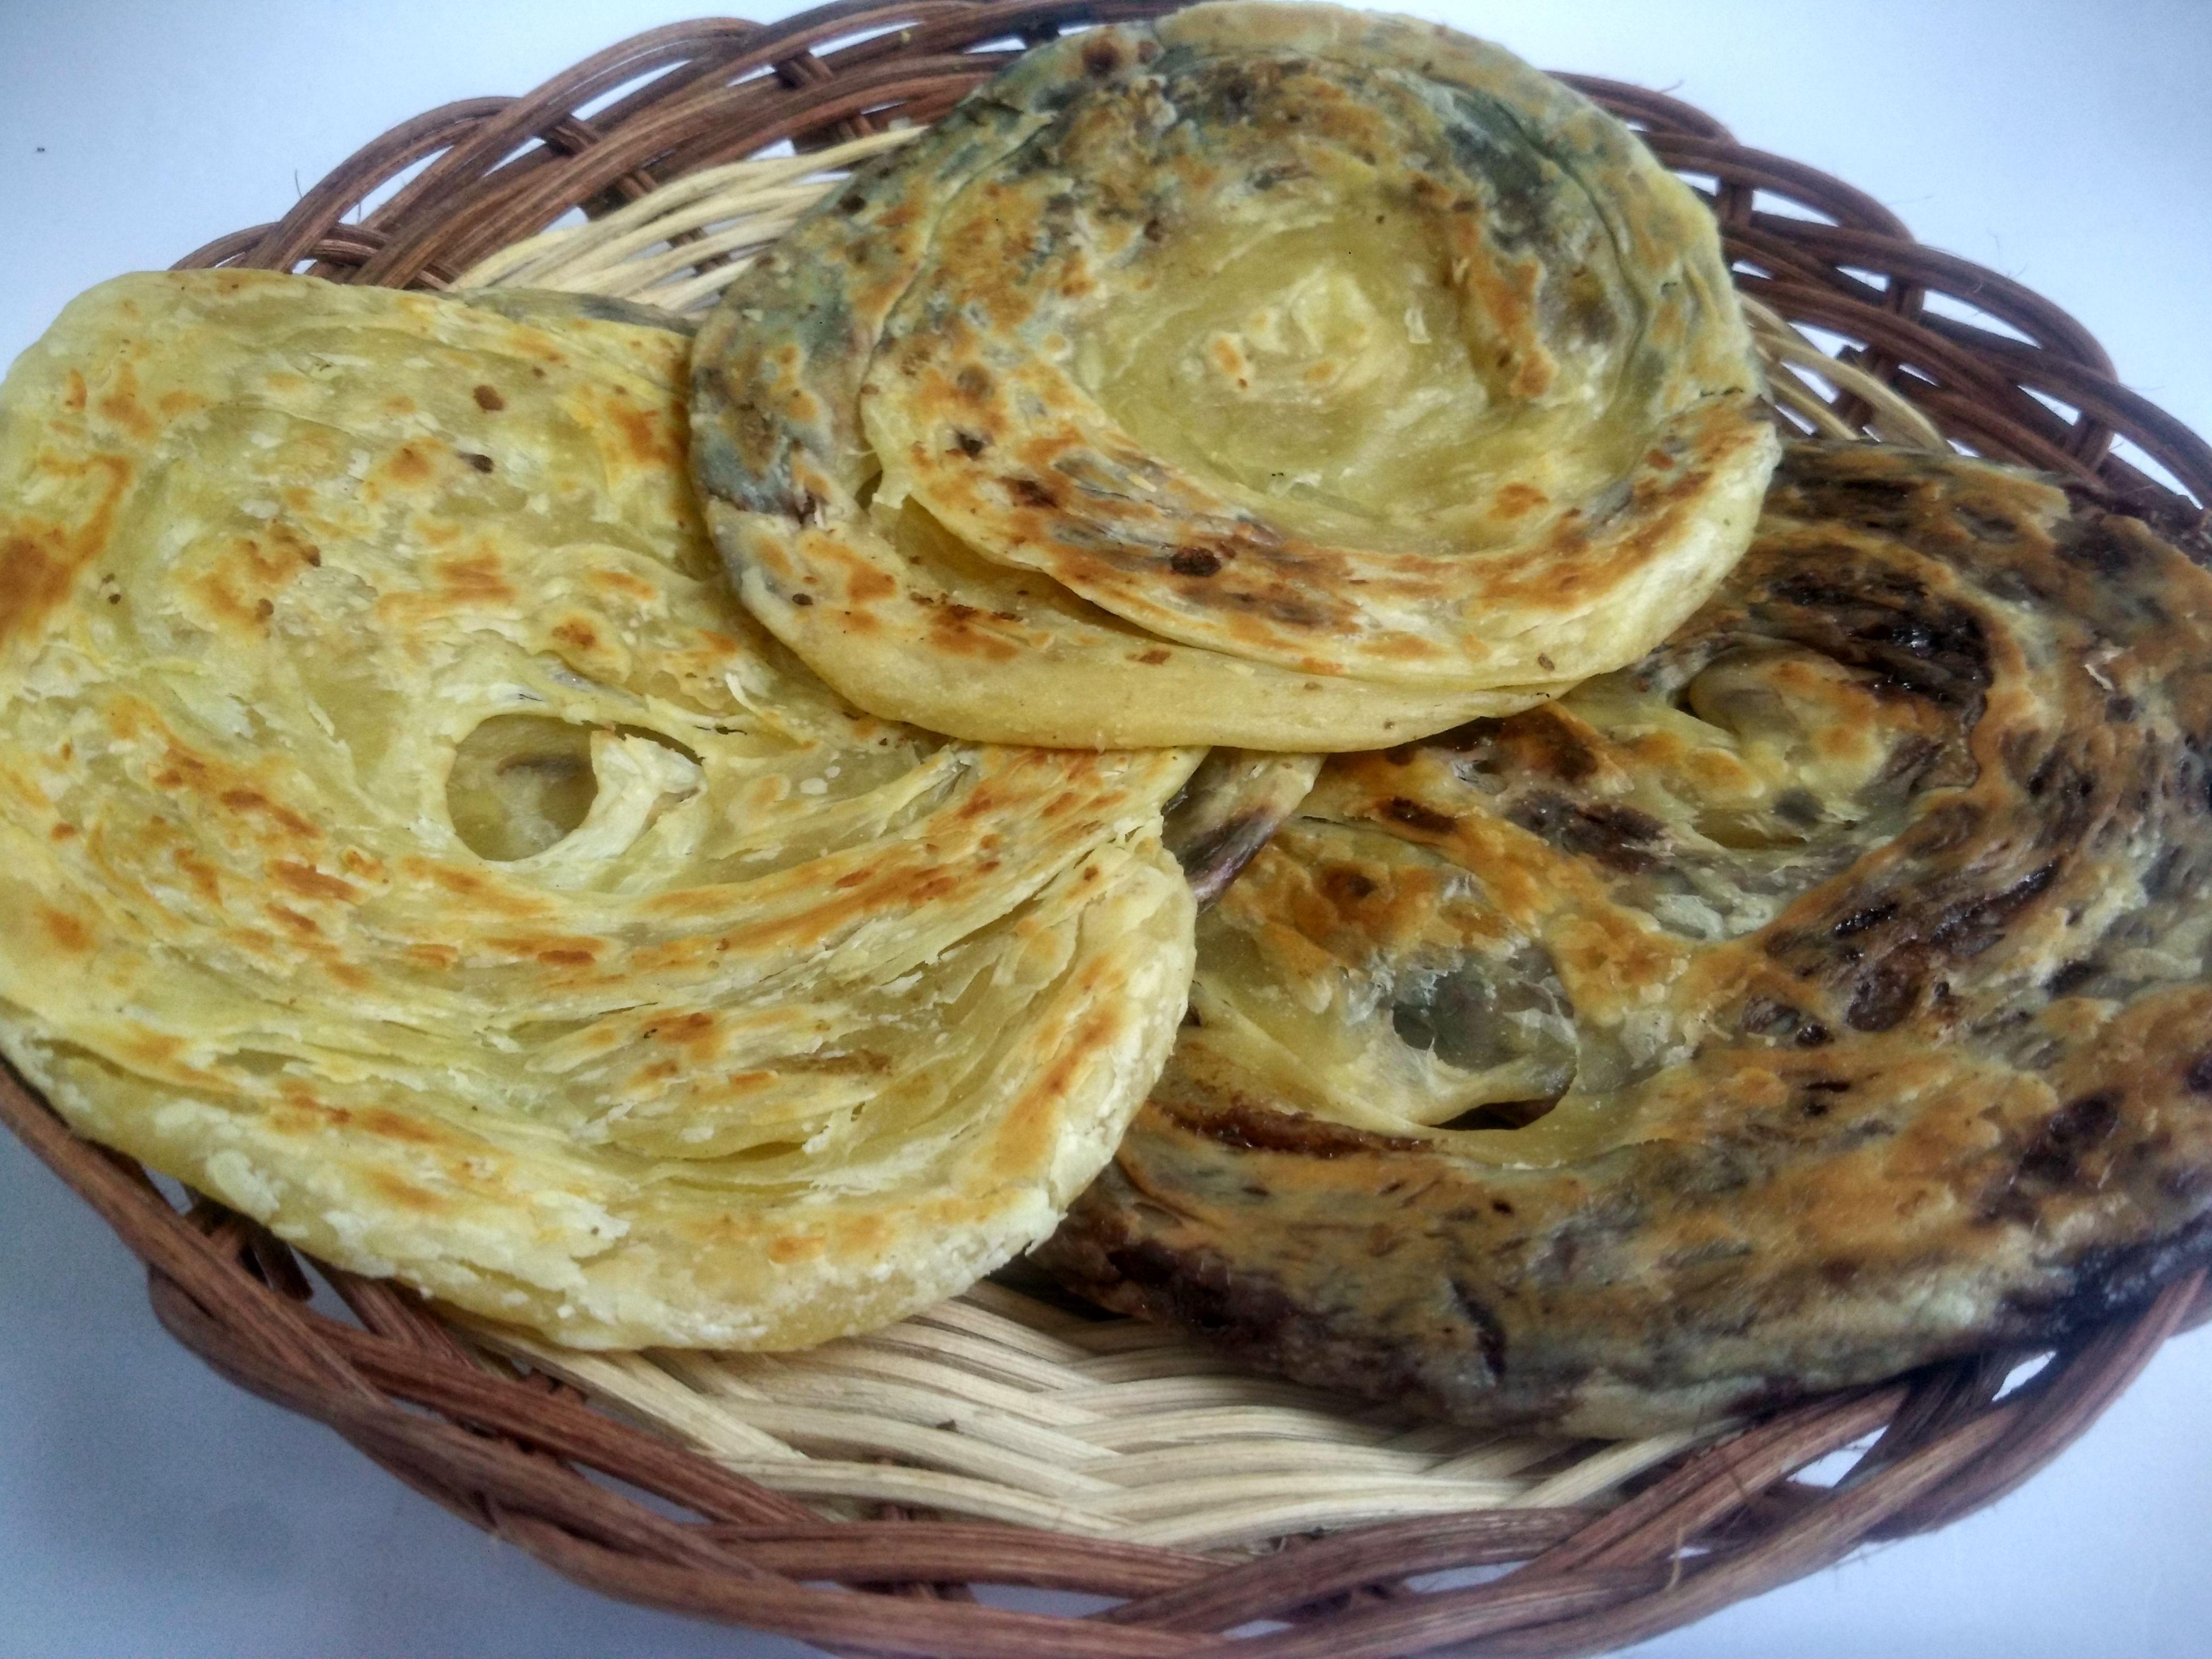 Resep Roti Maryam Atau Roti Canai Rotis Pembuat Roti Resep Roti